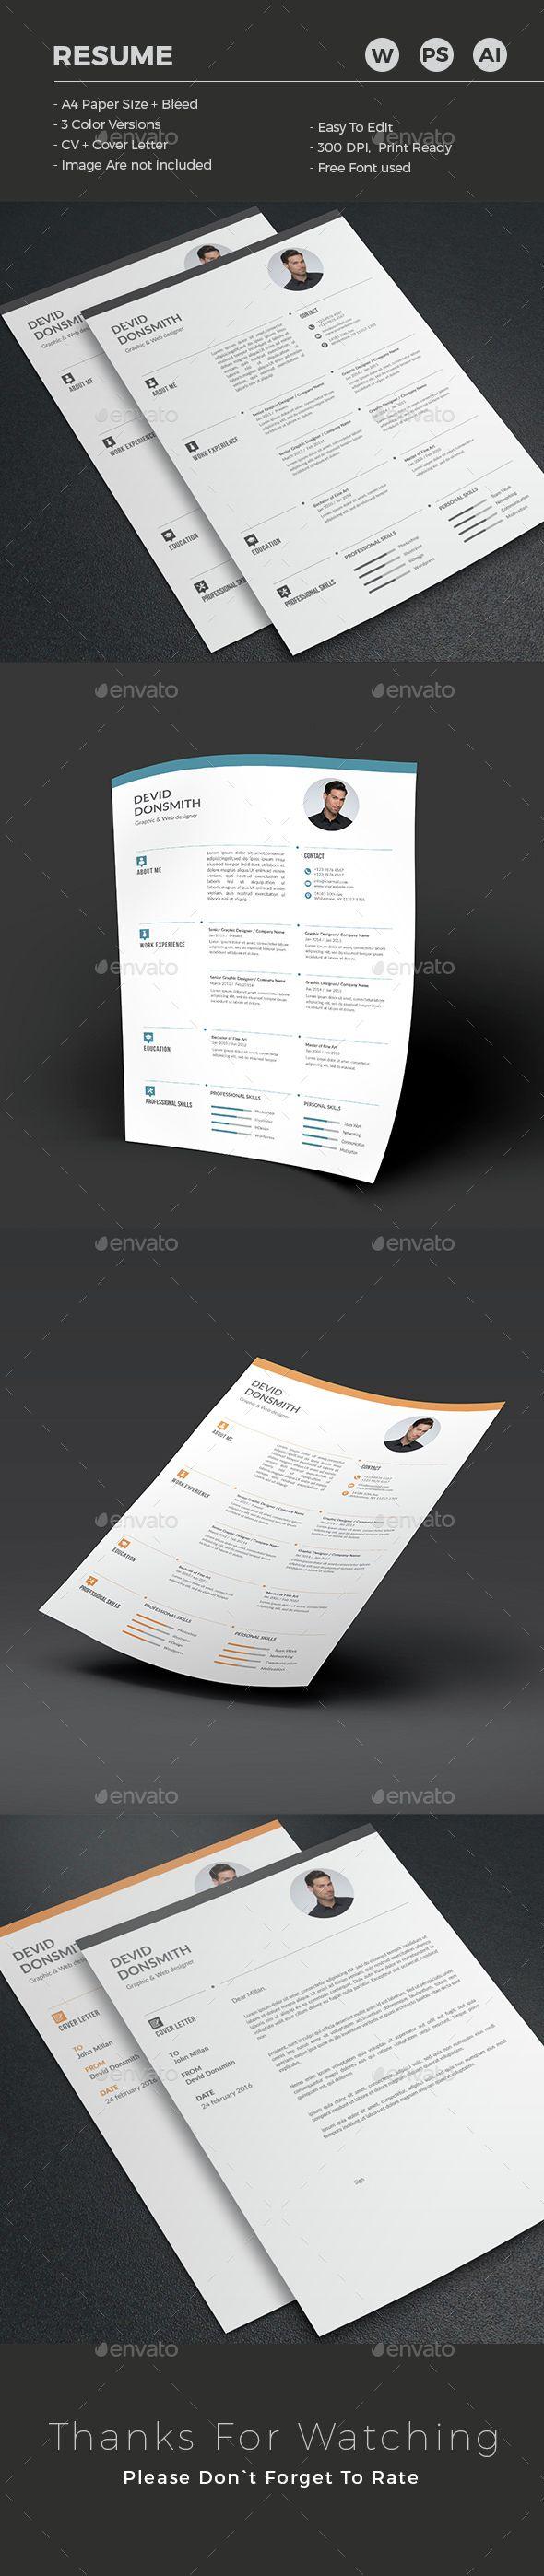 114 best Resume Templates images on Pinterest   Resume templates, Cv ...